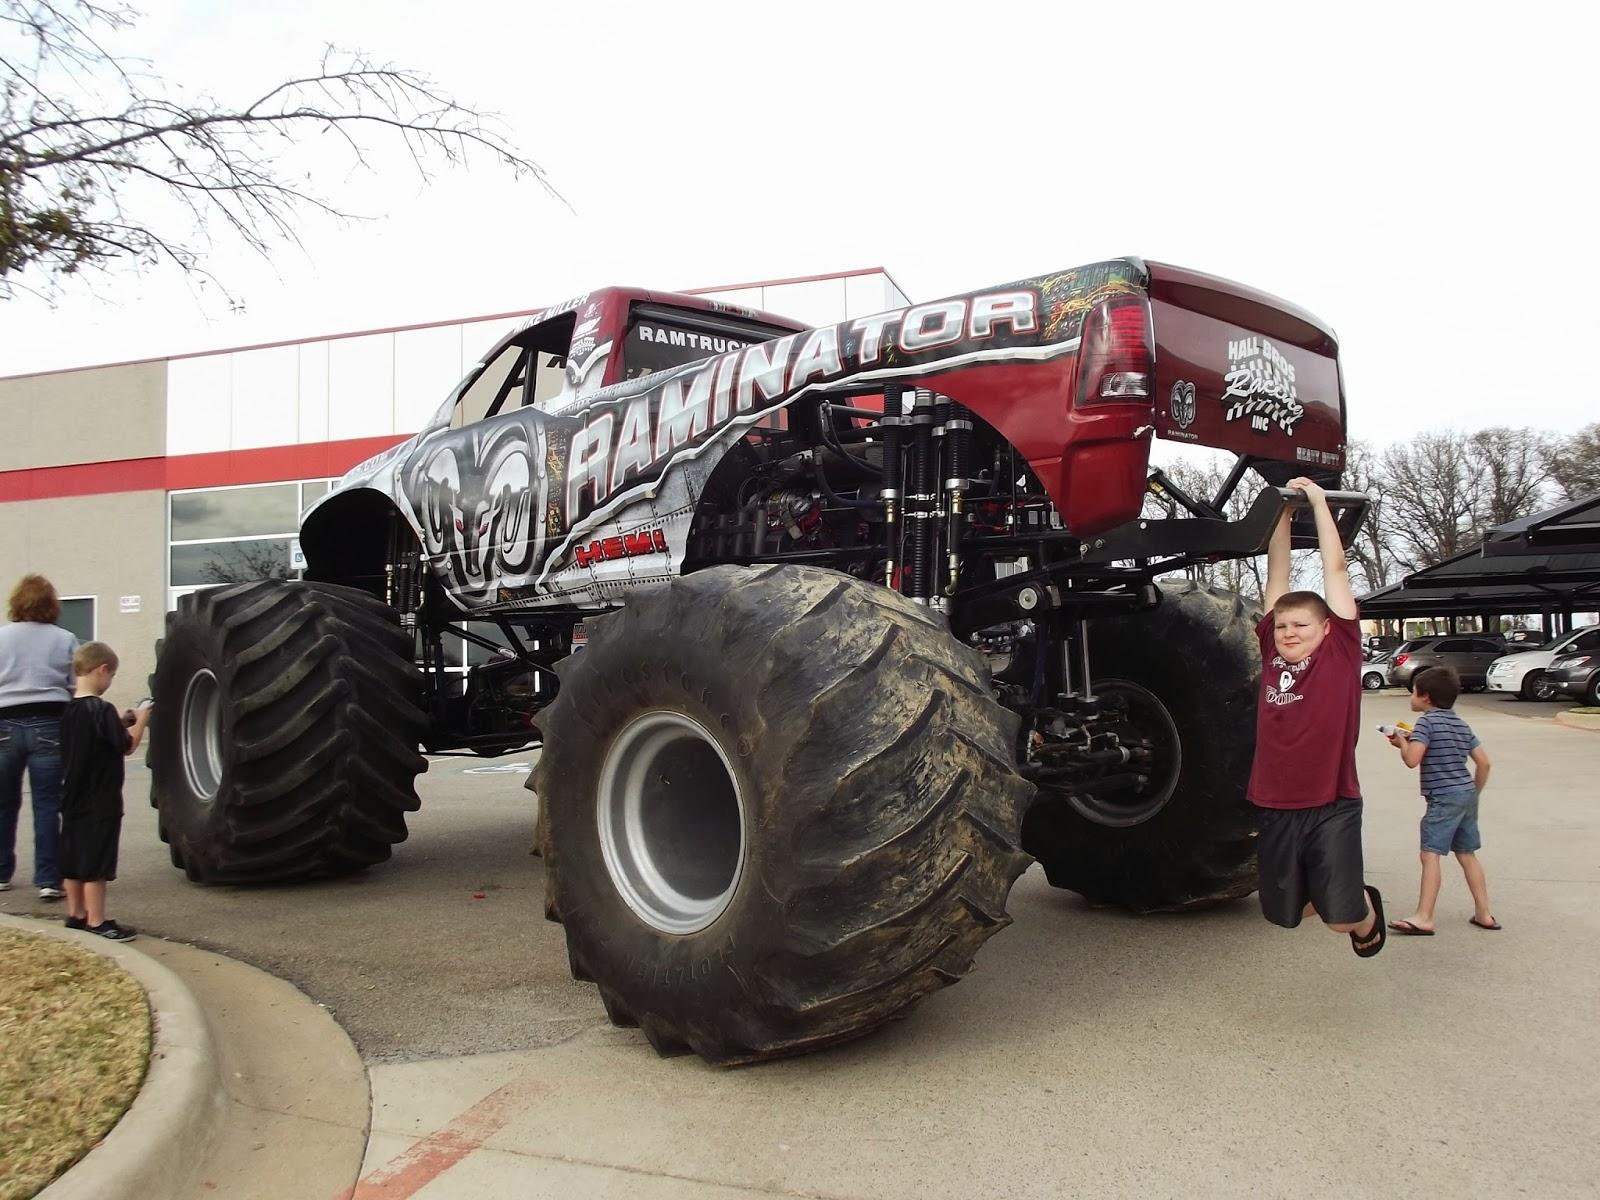 used monster trucks for sale autos post. Black Bedroom Furniture Sets. Home Design Ideas